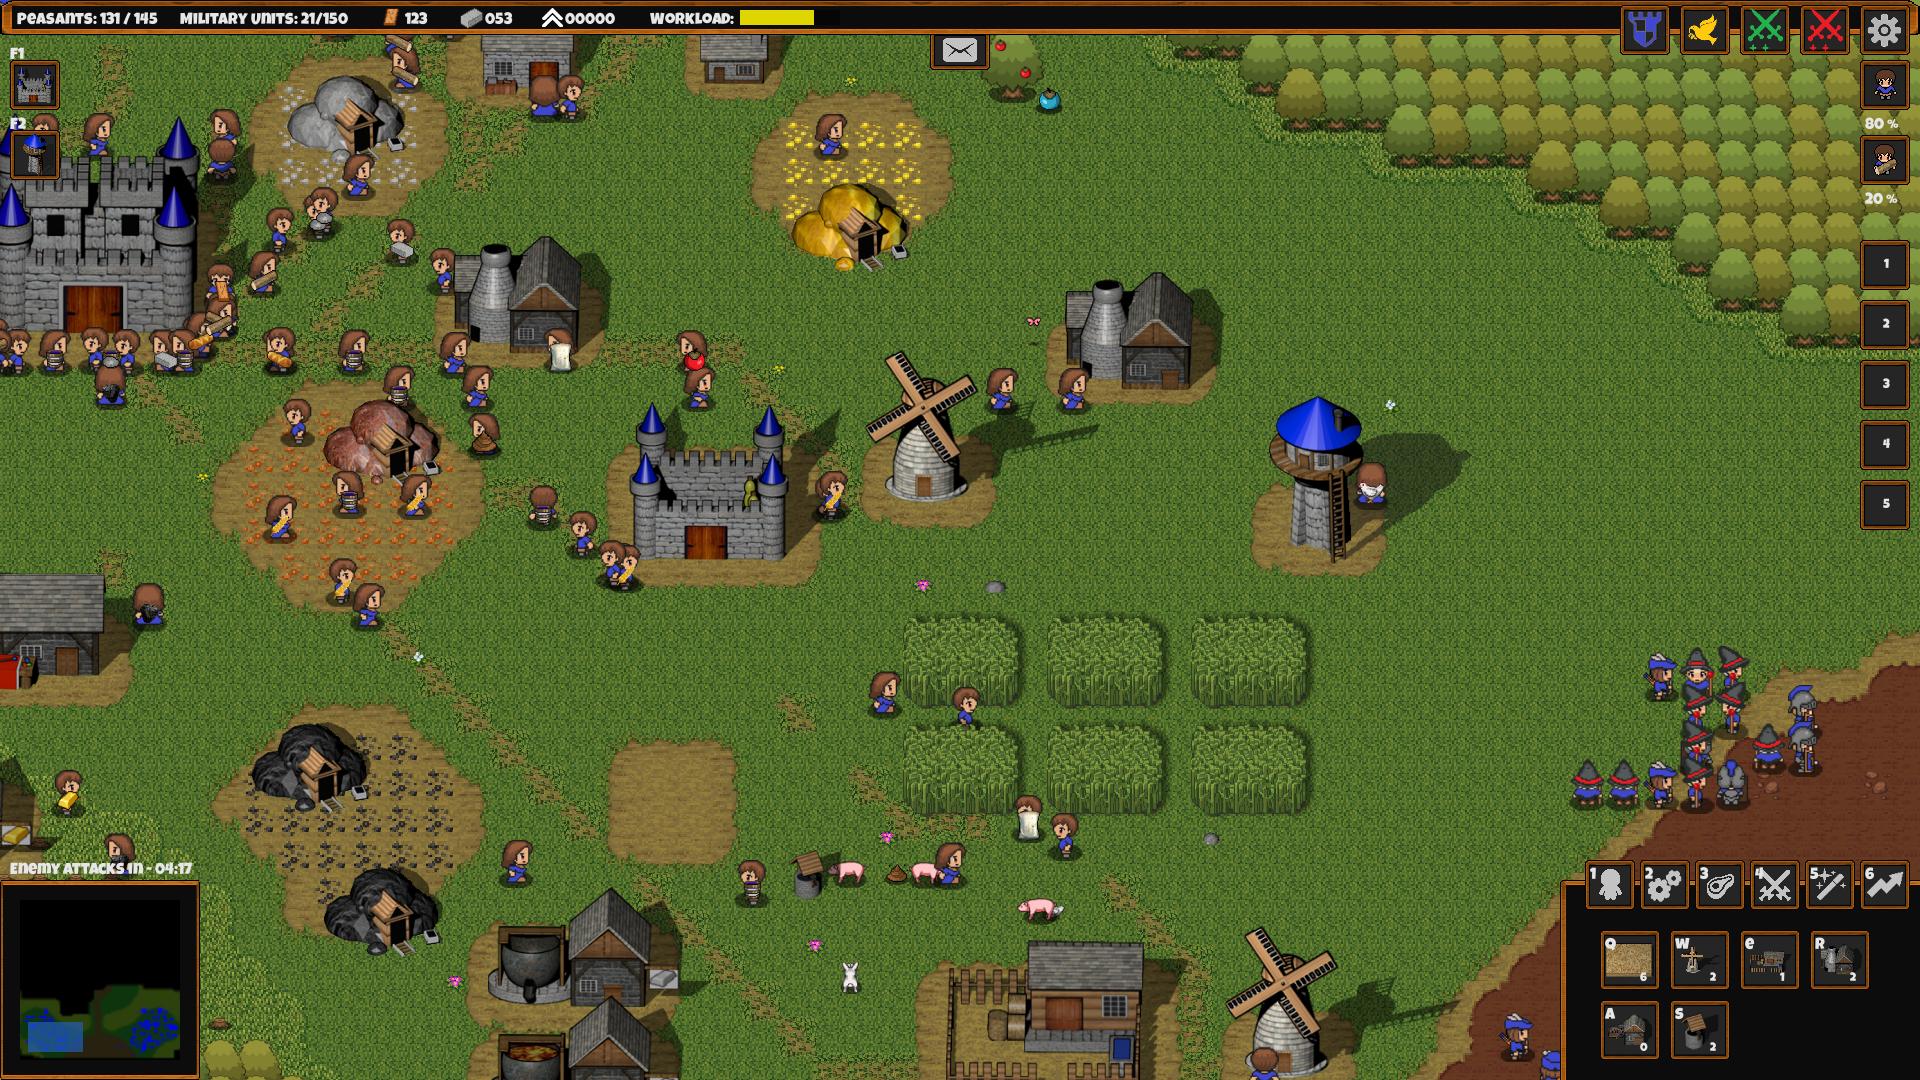 screenshot 5 1